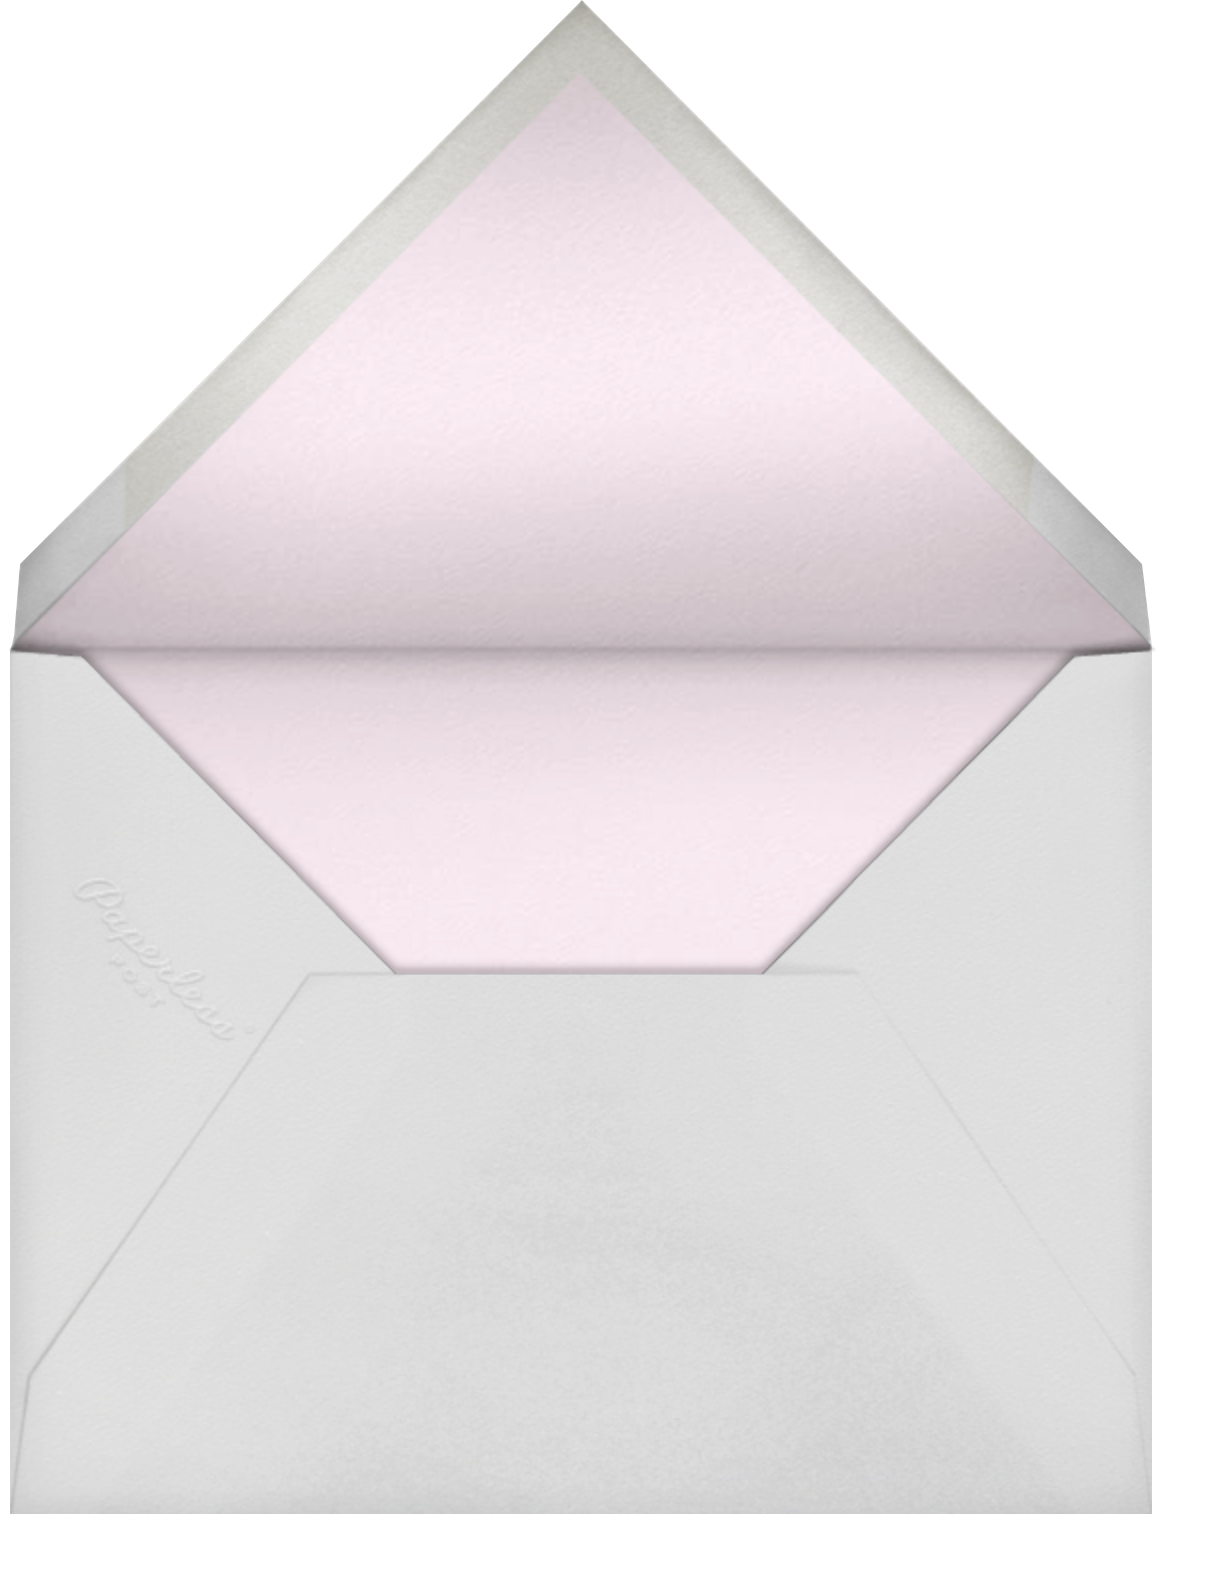 Merry Cherries - kate spade new york - Bachelorette party - envelope back